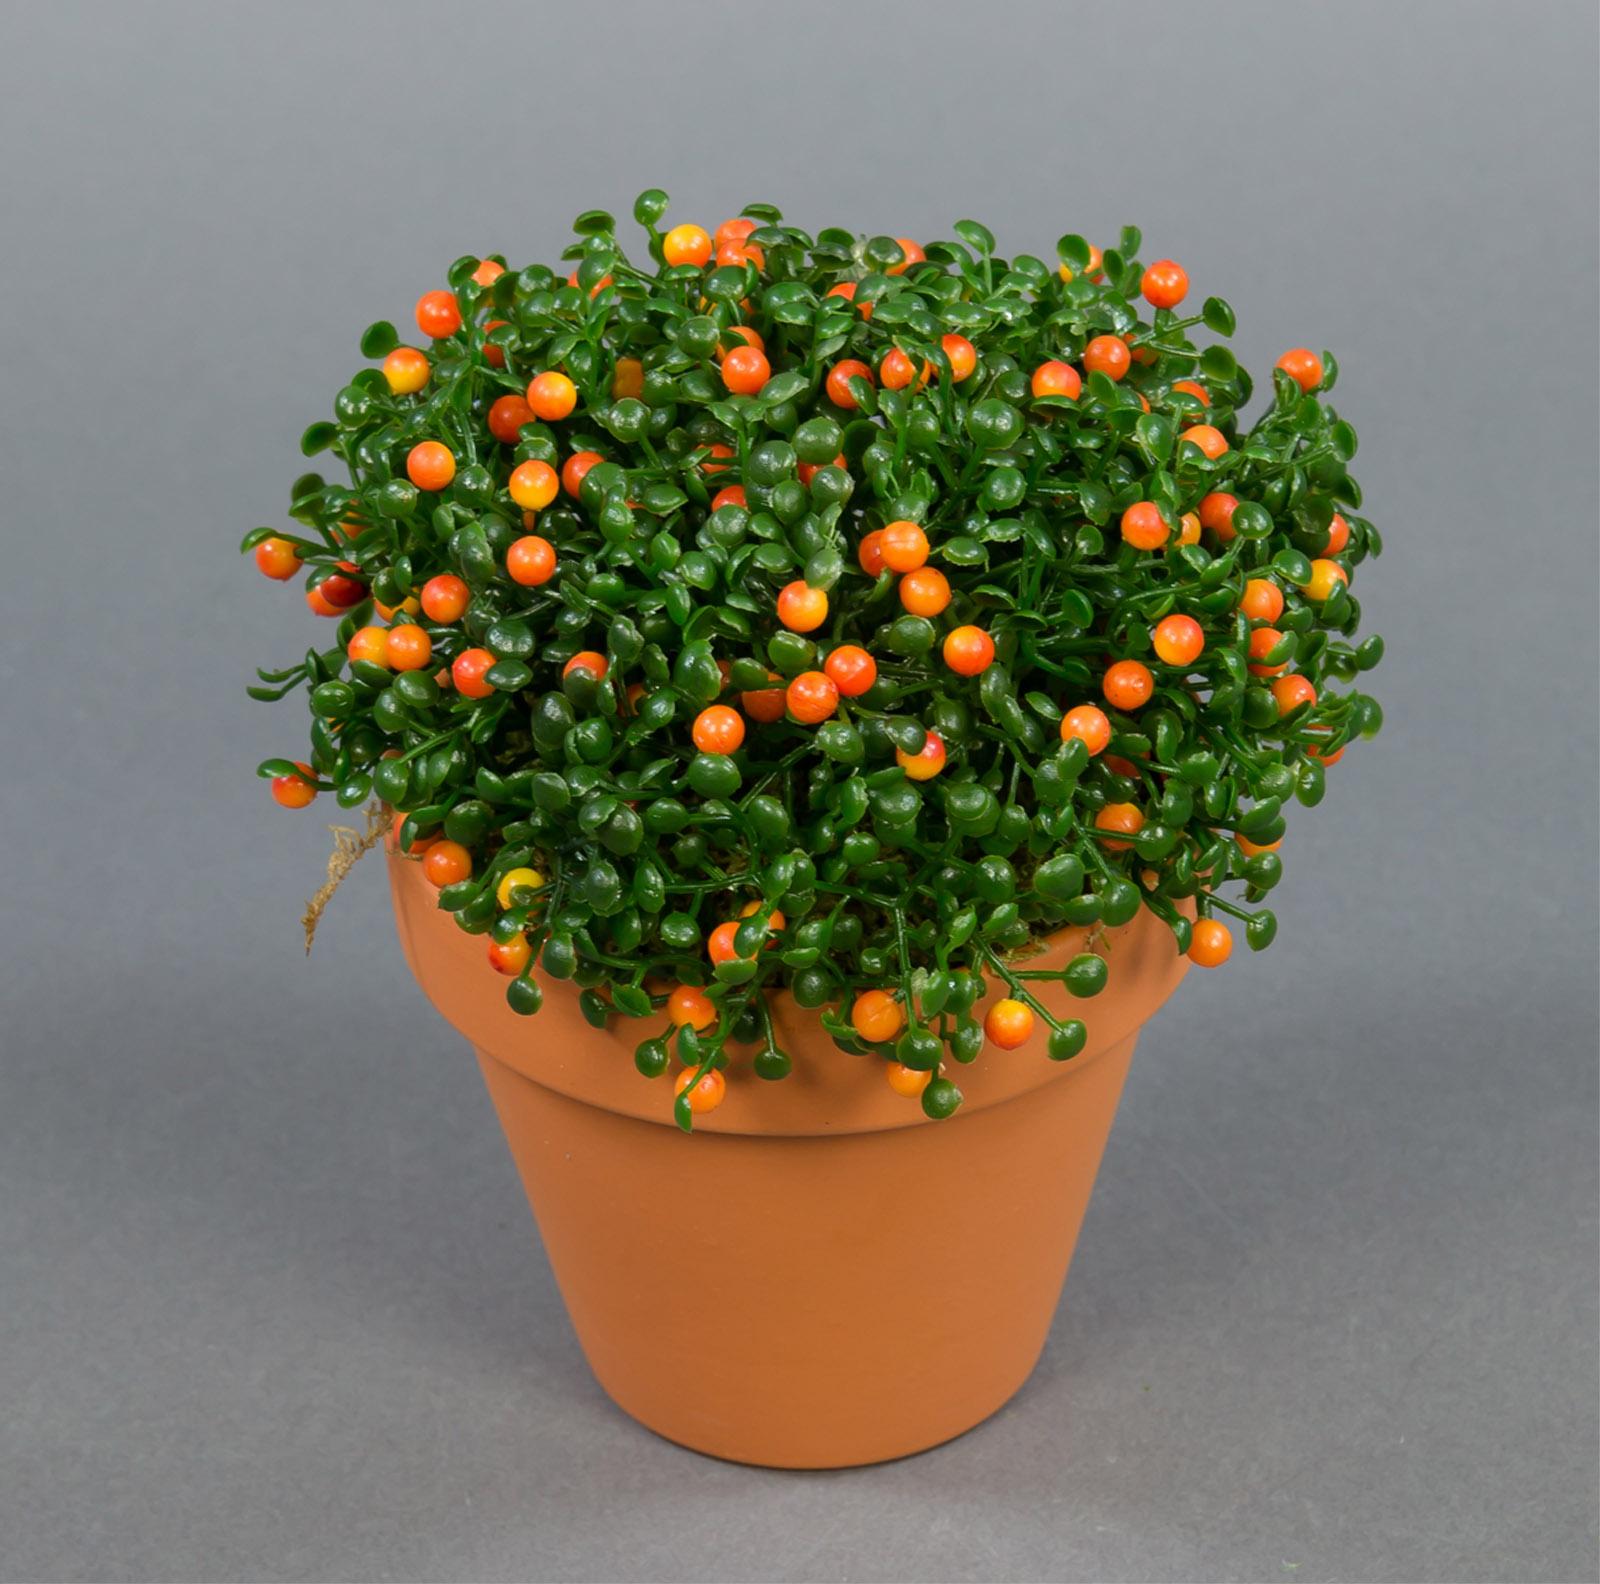 nertera pflanze orange 15cm im topf pf kunstpflanzen. Black Bedroom Furniture Sets. Home Design Ideas